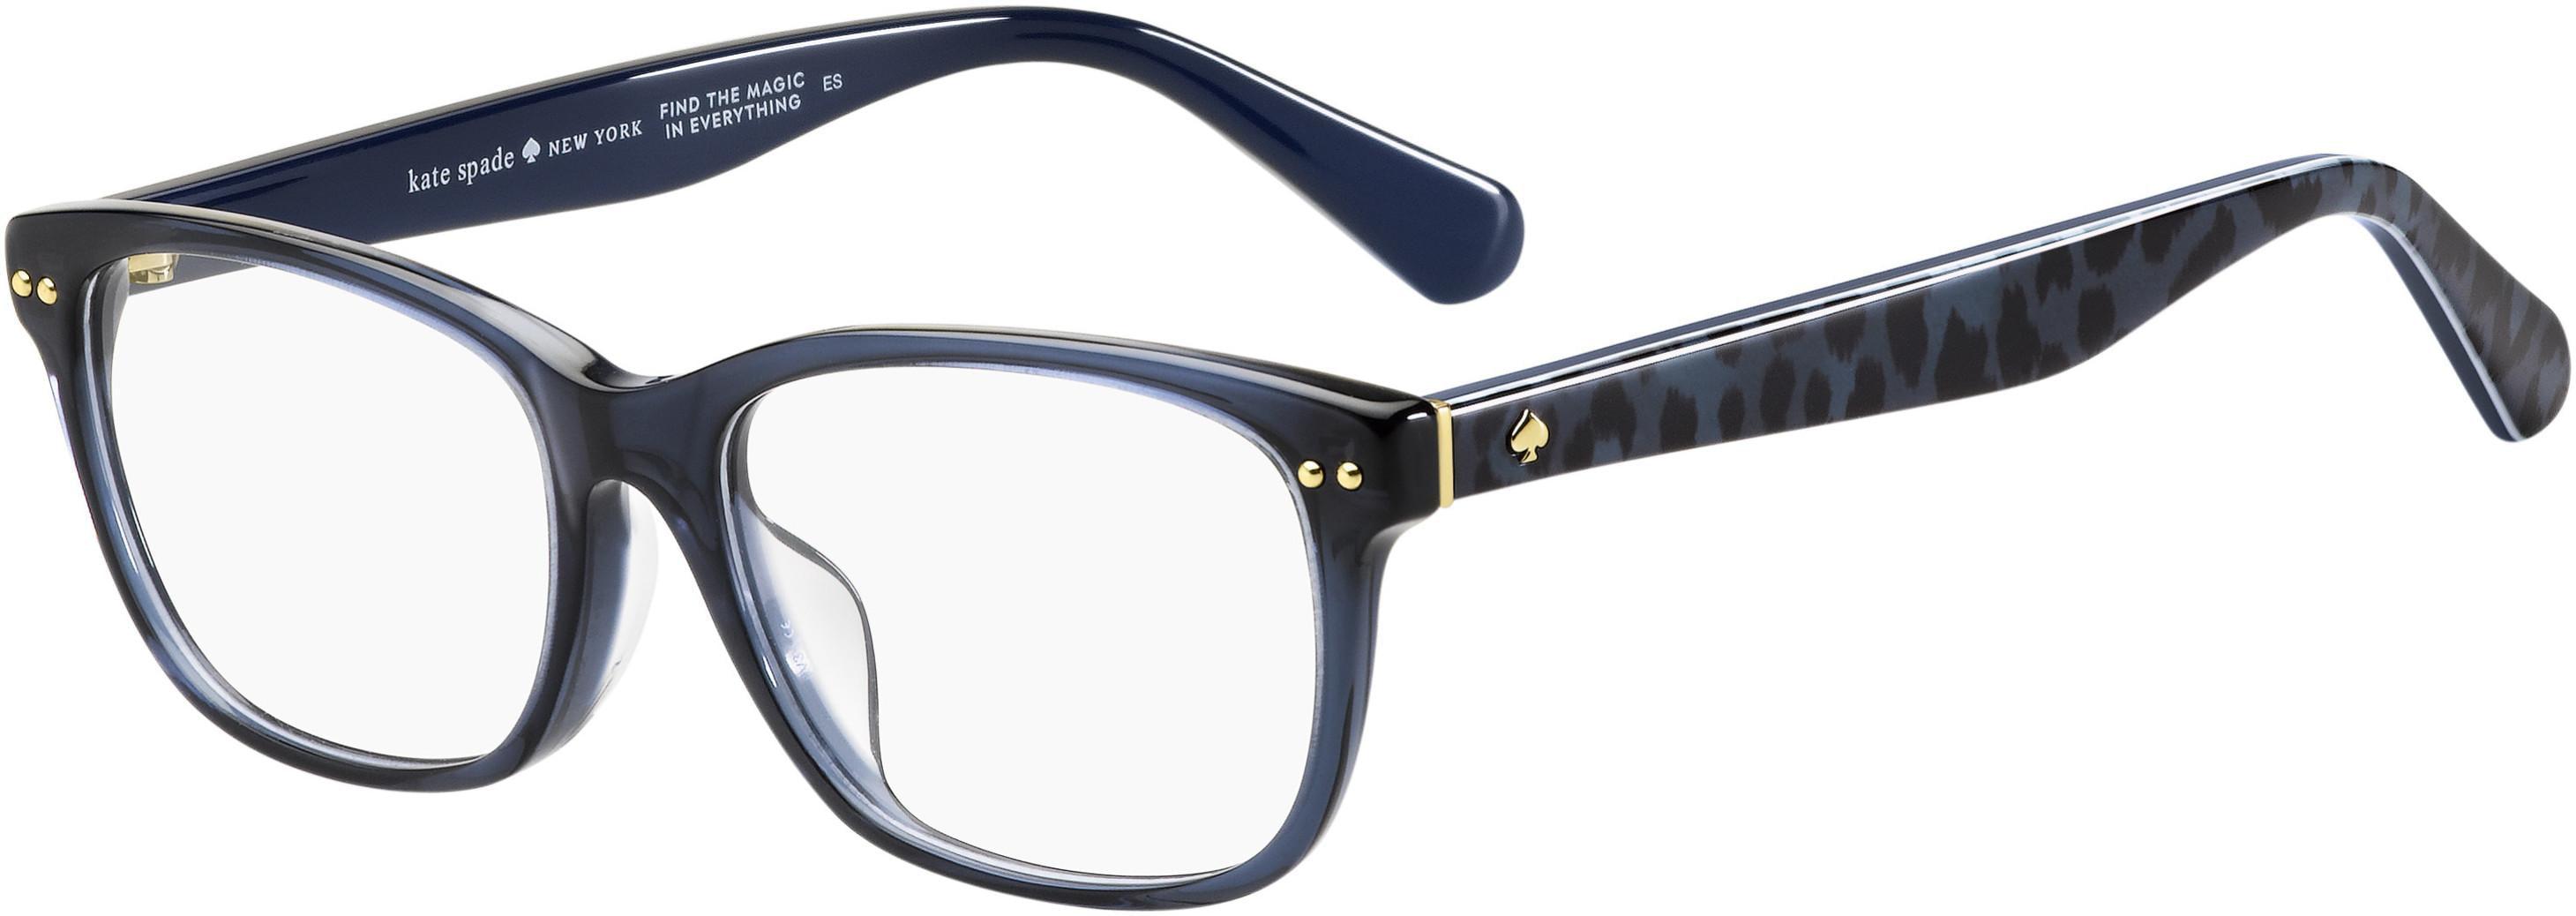 Kate Spade Ks Cailin Eyeglasses 0x0d Violet Marbleme Walmart Com Walmart Com